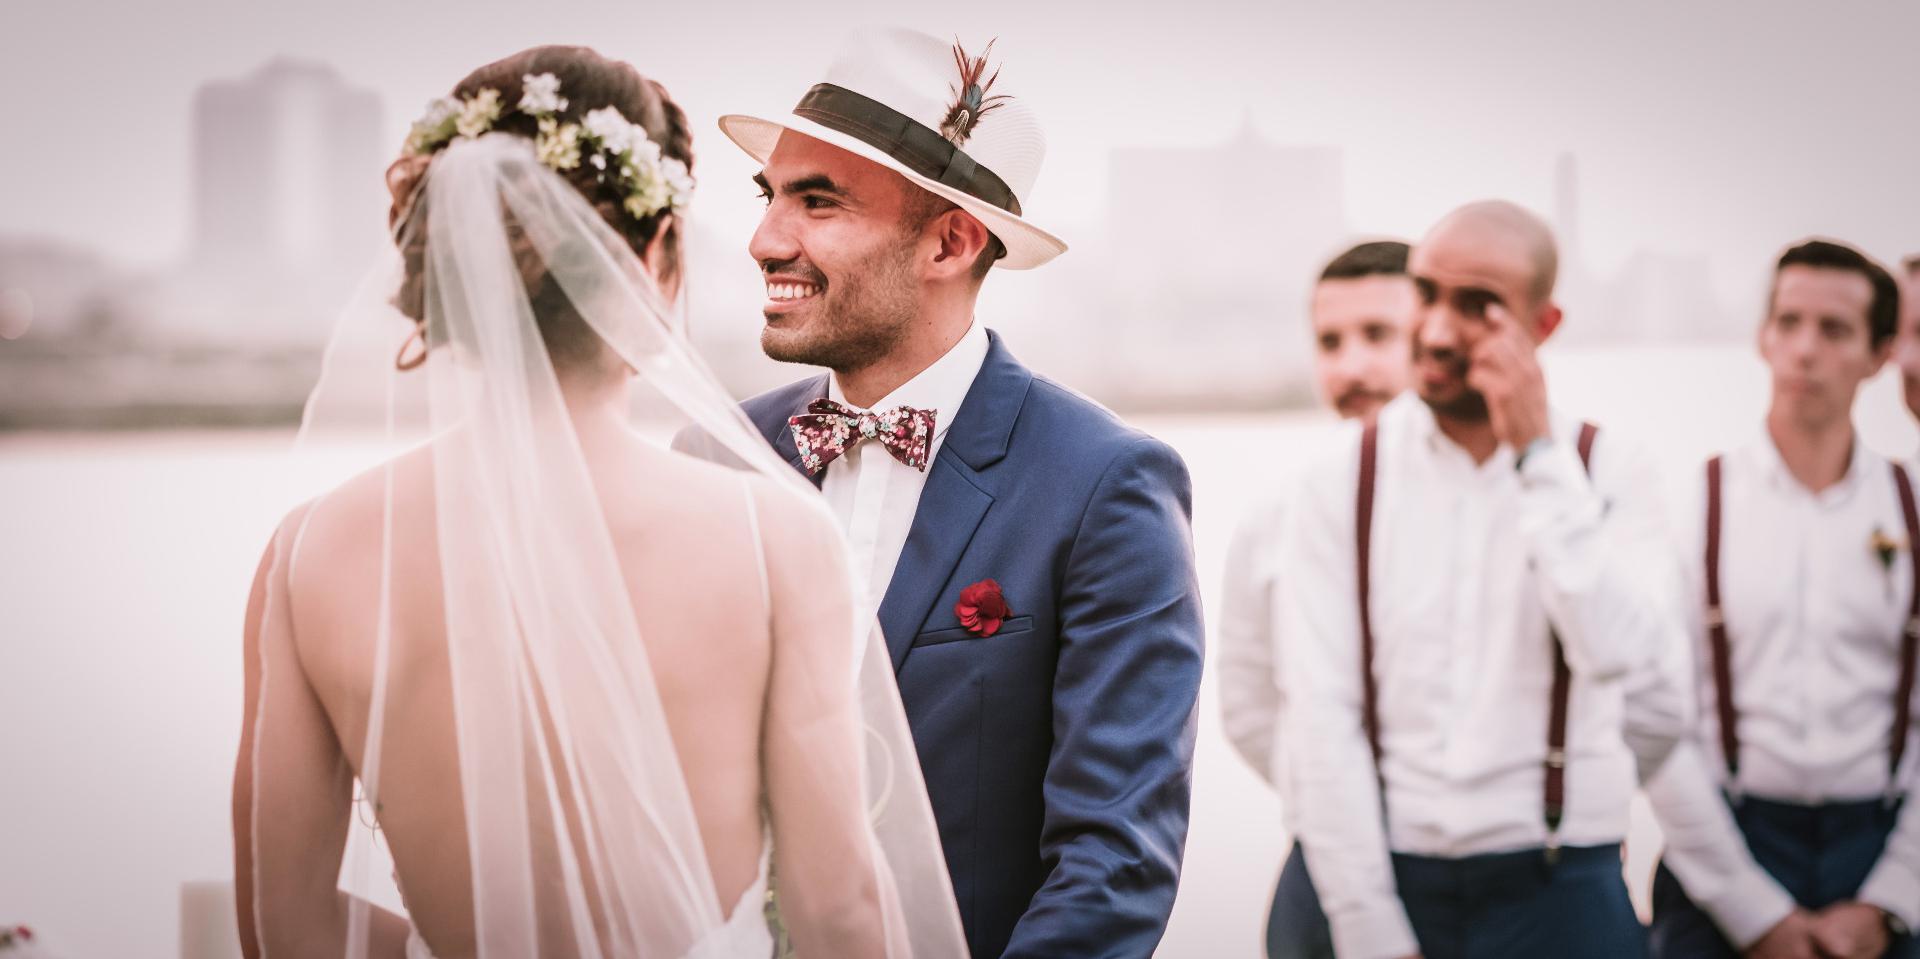 bodas-sin-clasificar-sin-tema-cuba-29291.jpg